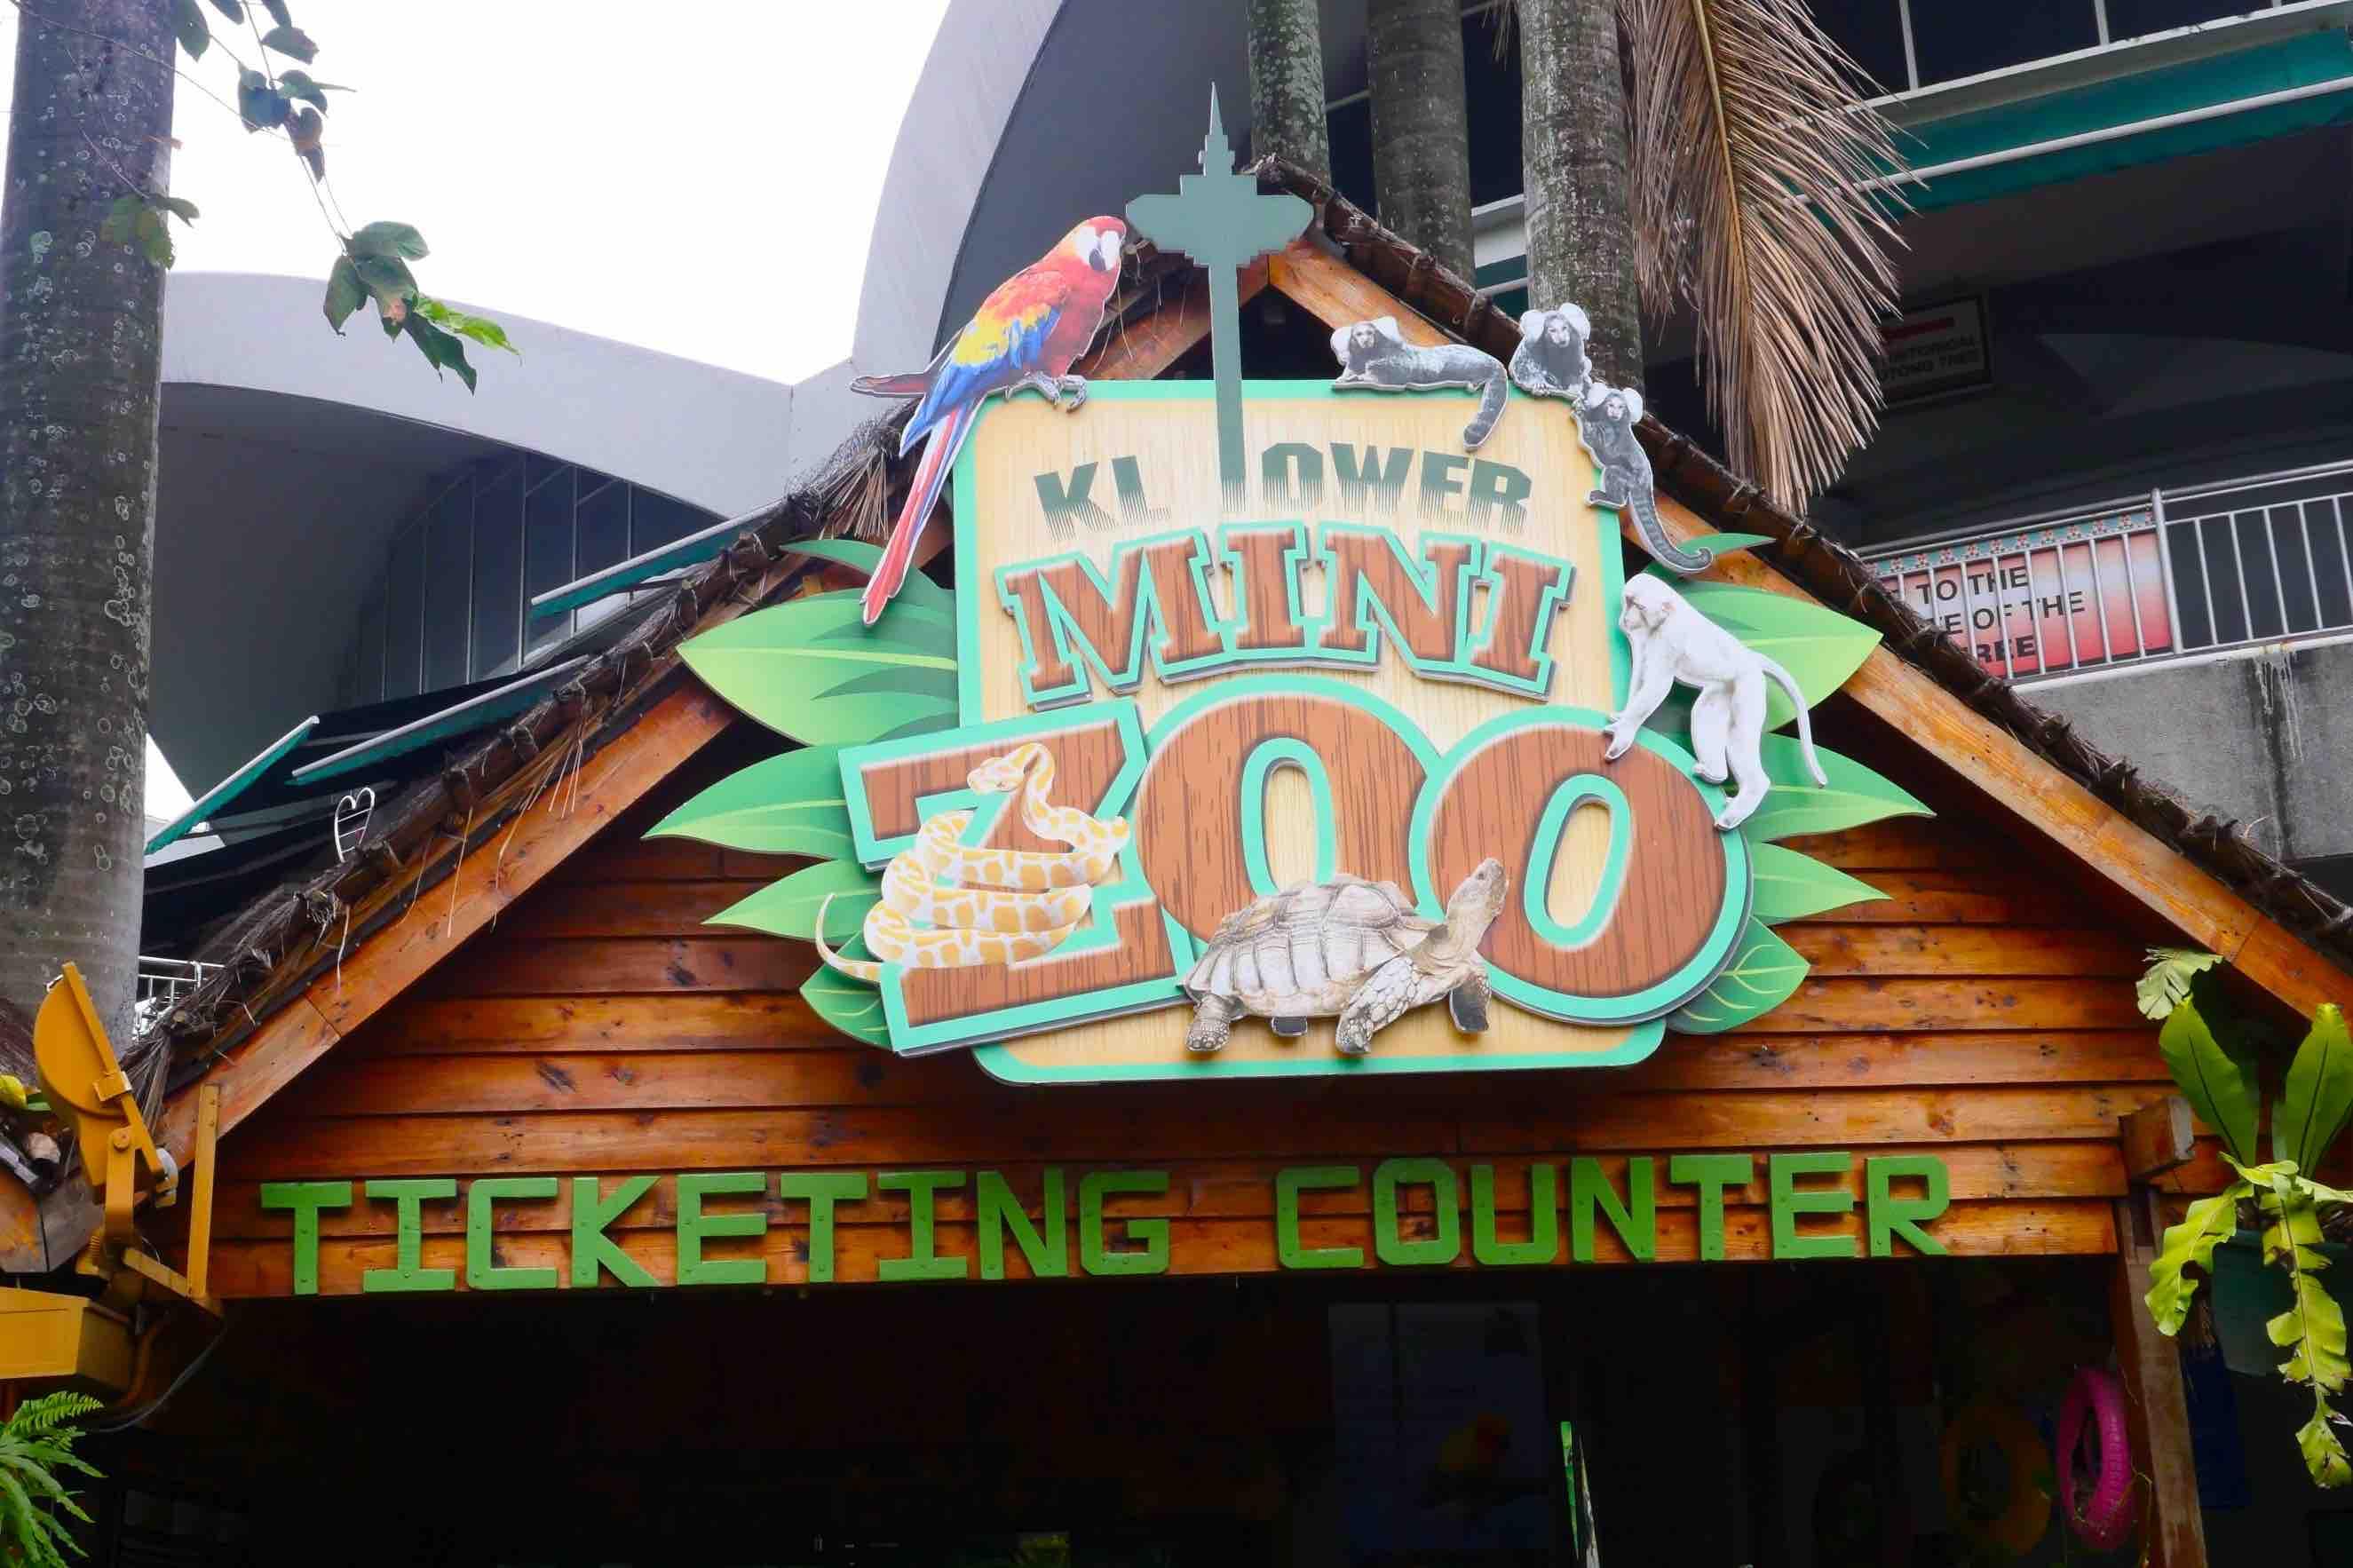 KL Tower Mini Zoo , Jom bawa Anak Anak Cuti Sekolah ni